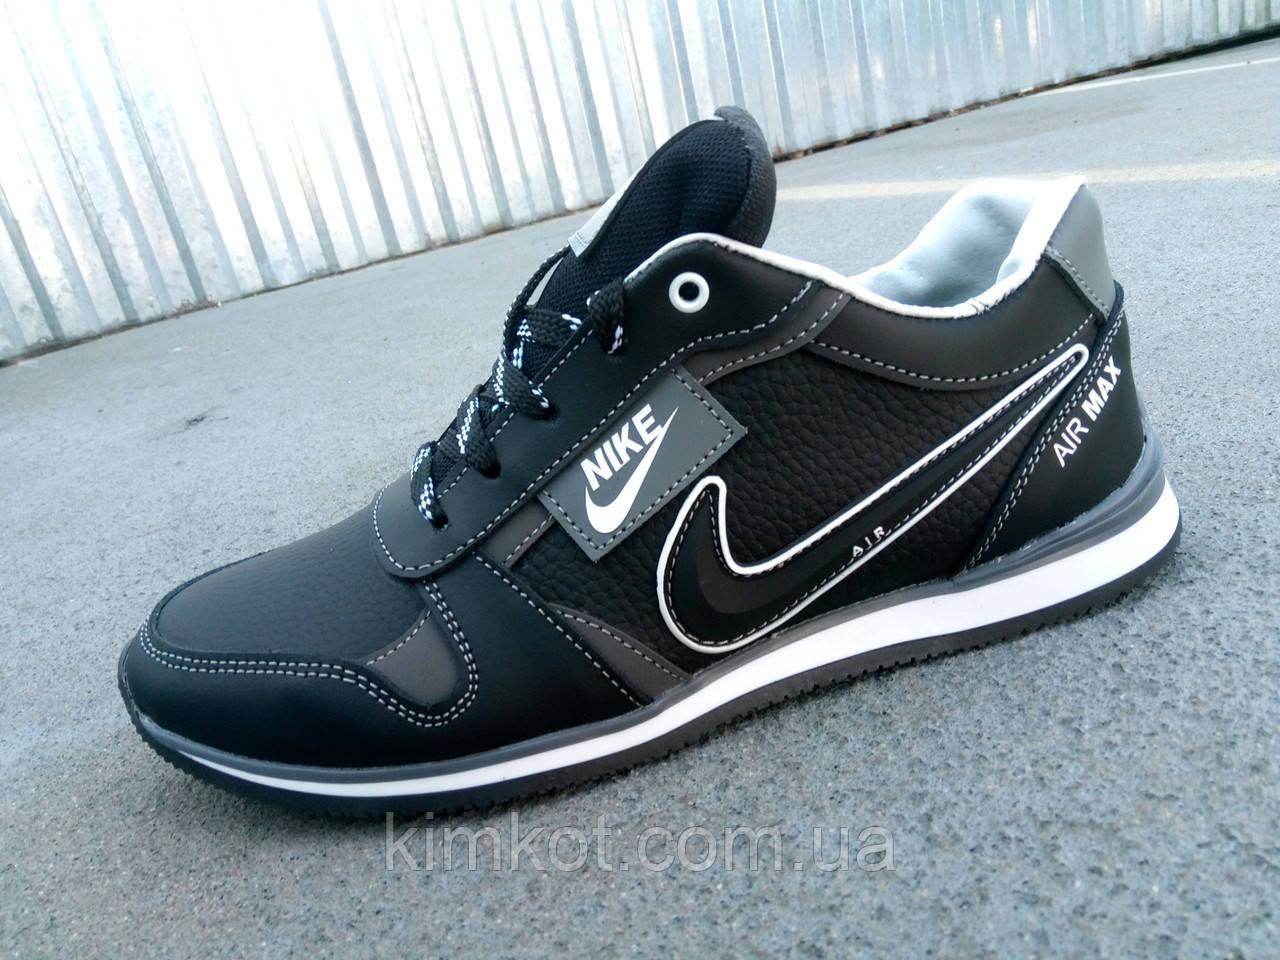 e7daba36ae76 Кроссовки мужские кожаные Nike реплика 40 -45 р-р  продажа, цена в ...